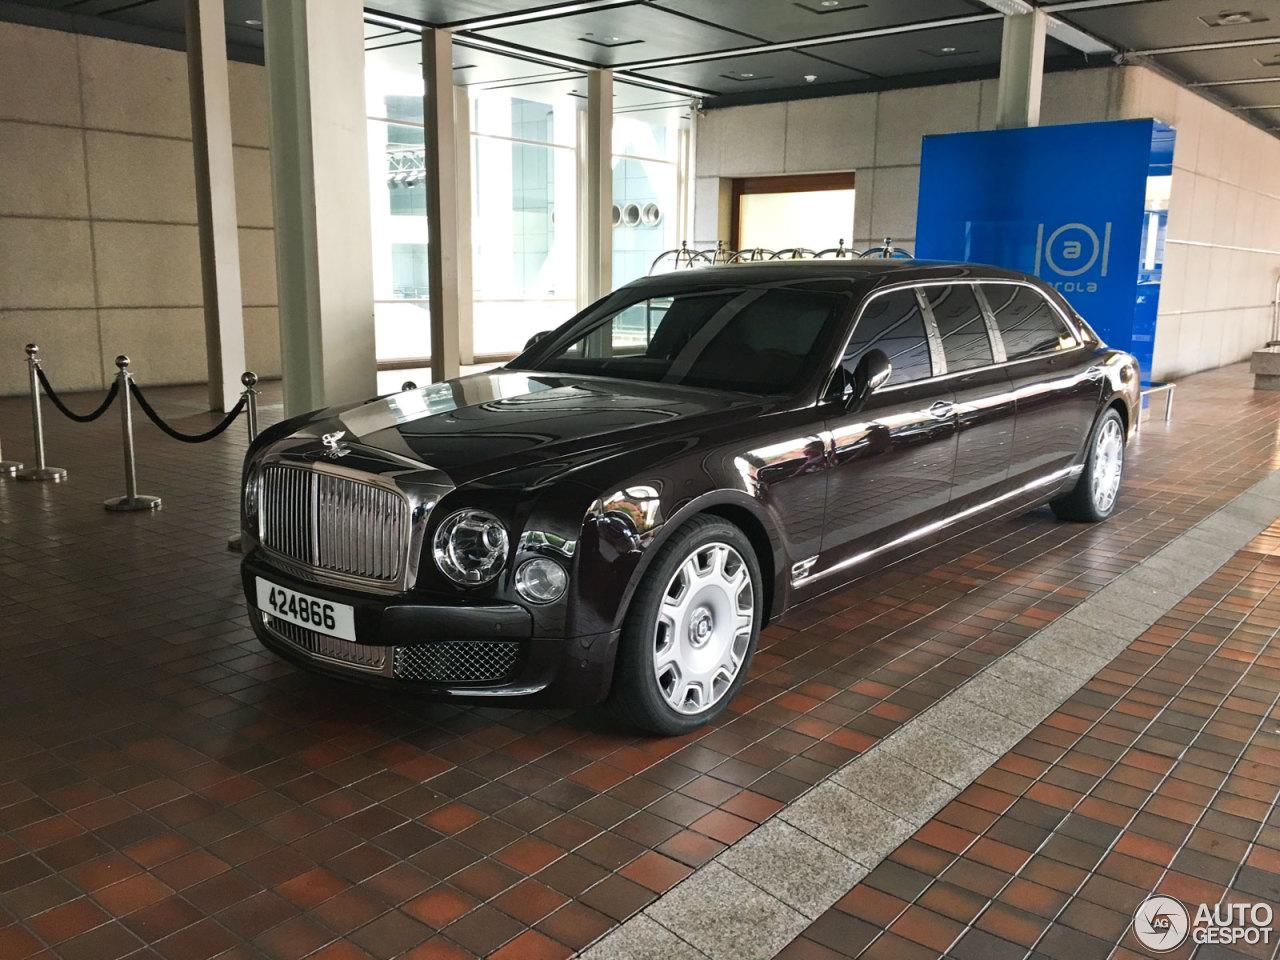 Bentley Mulsanne Grand Limousine 17 August 2016 Autogespot